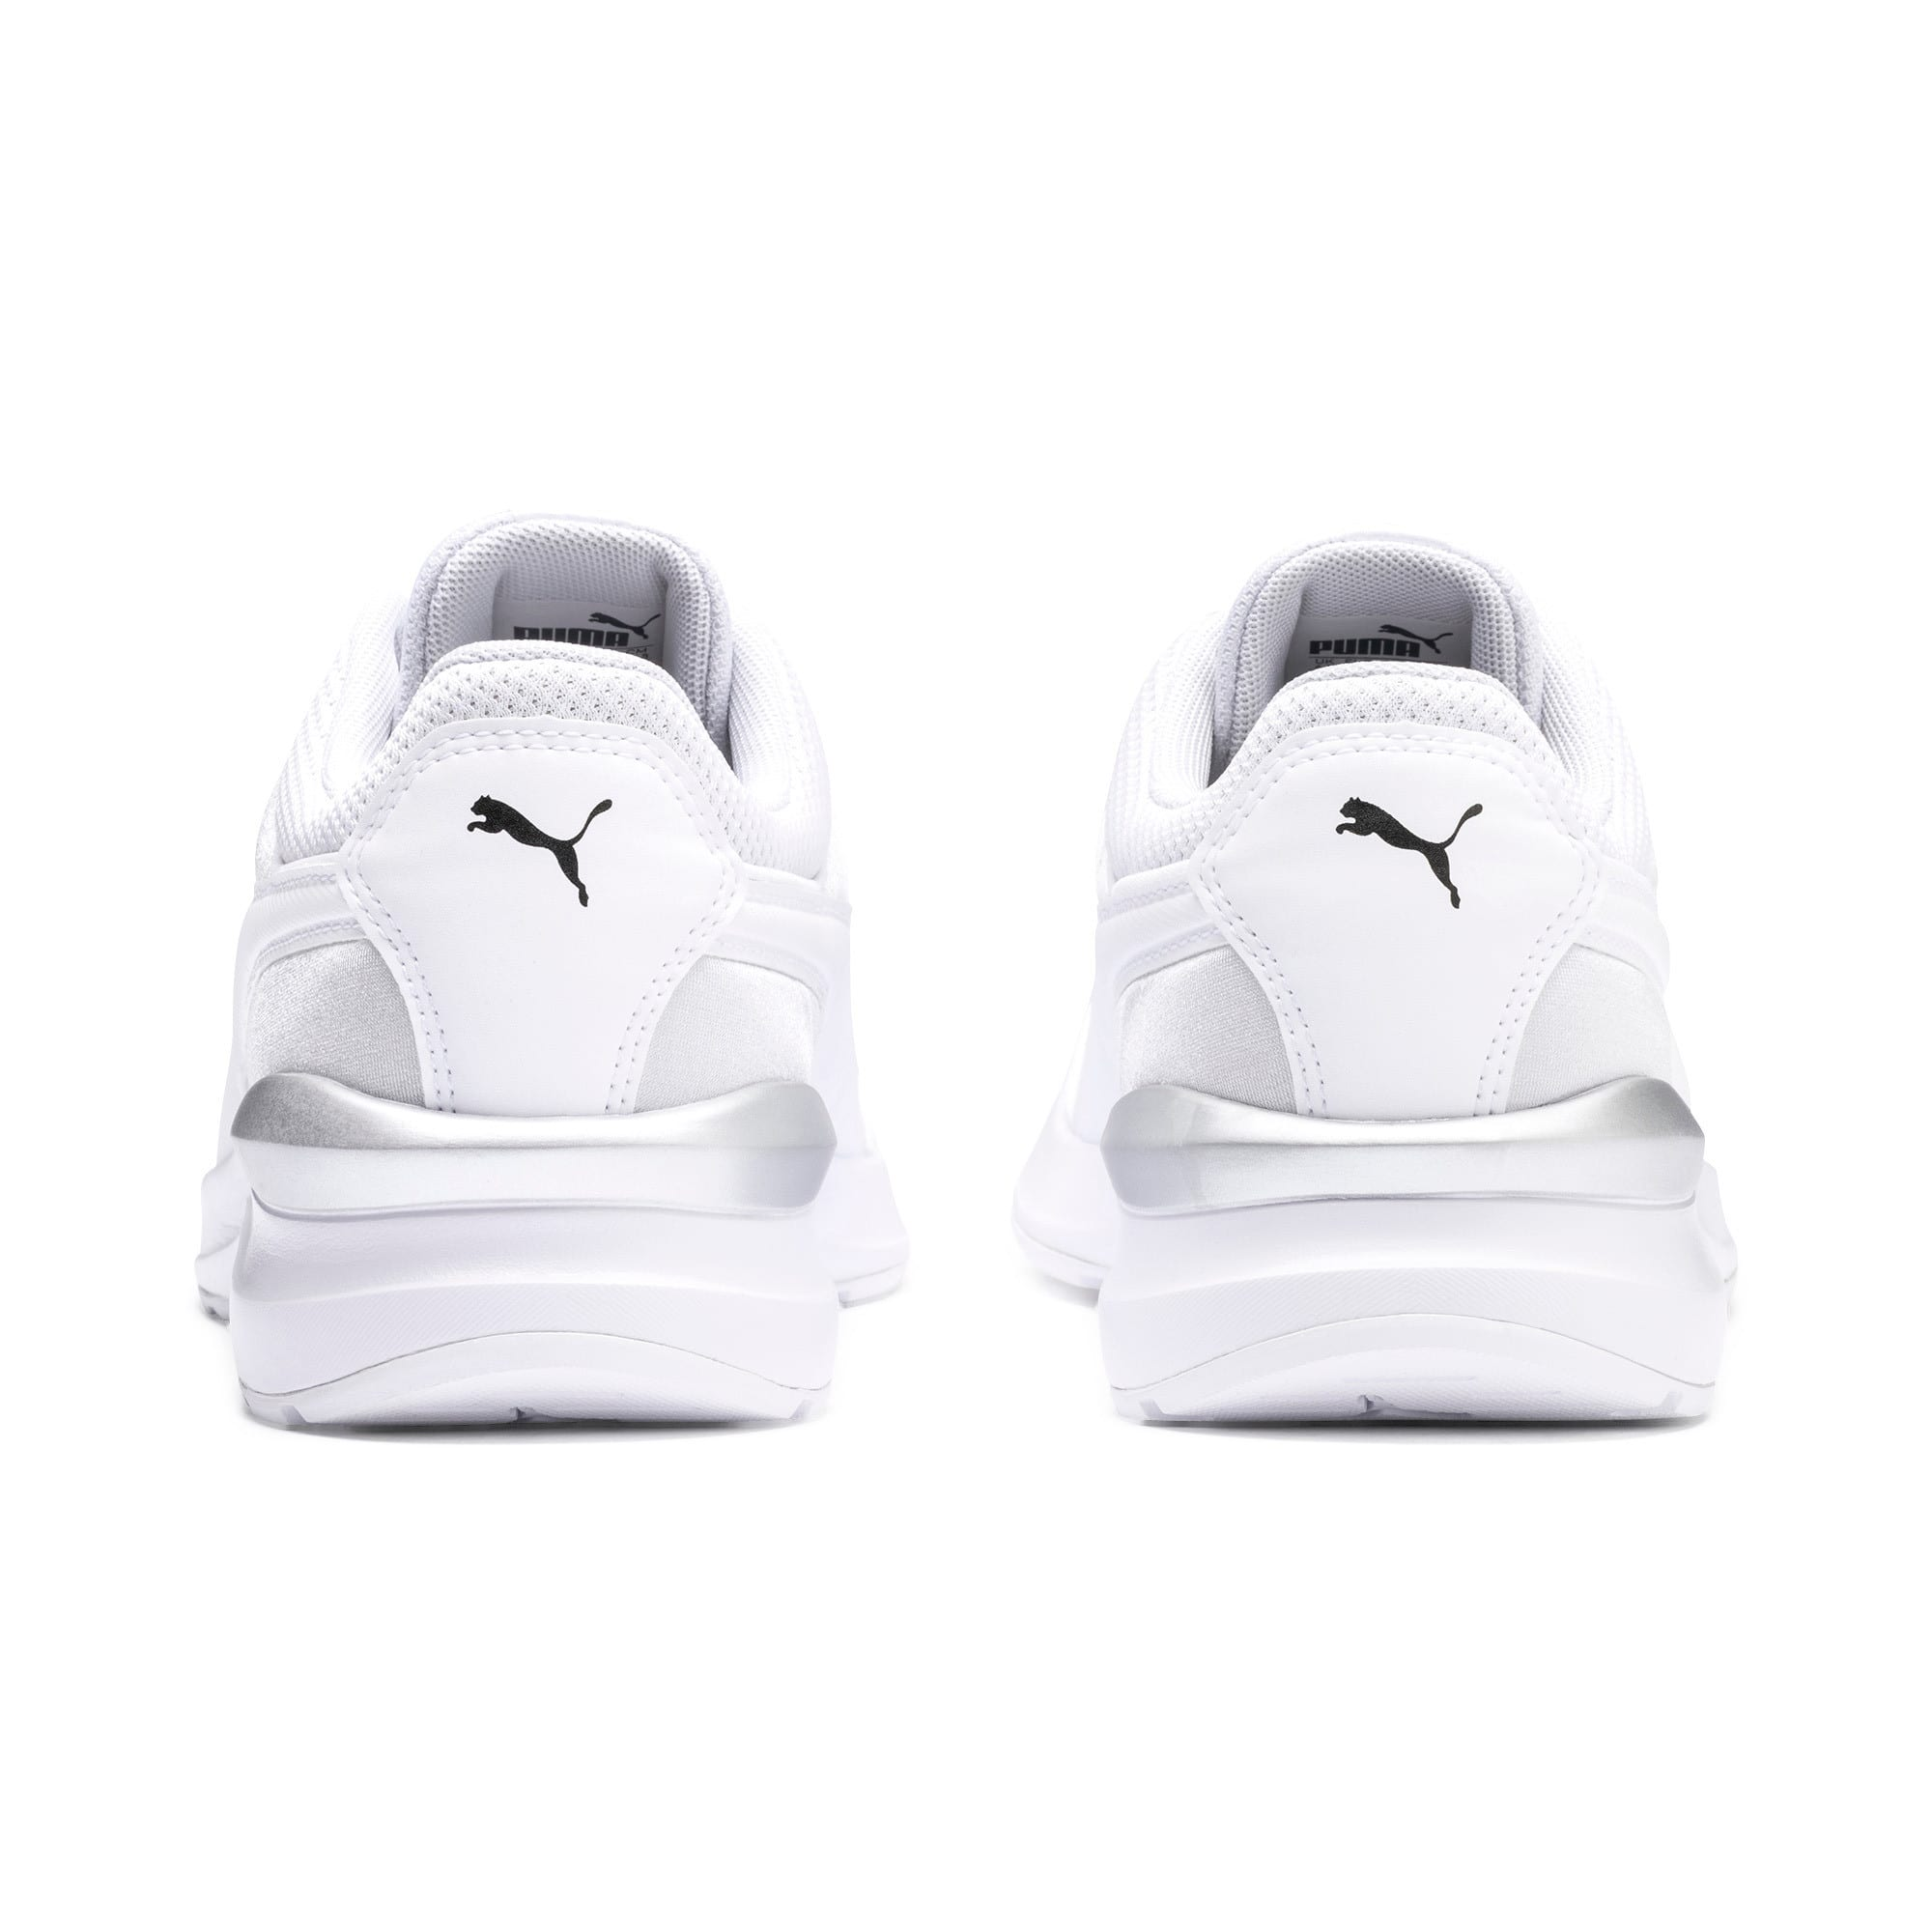 Thumbnail 4 of Adela Women's Sneakers, Puma White-Puma White, medium